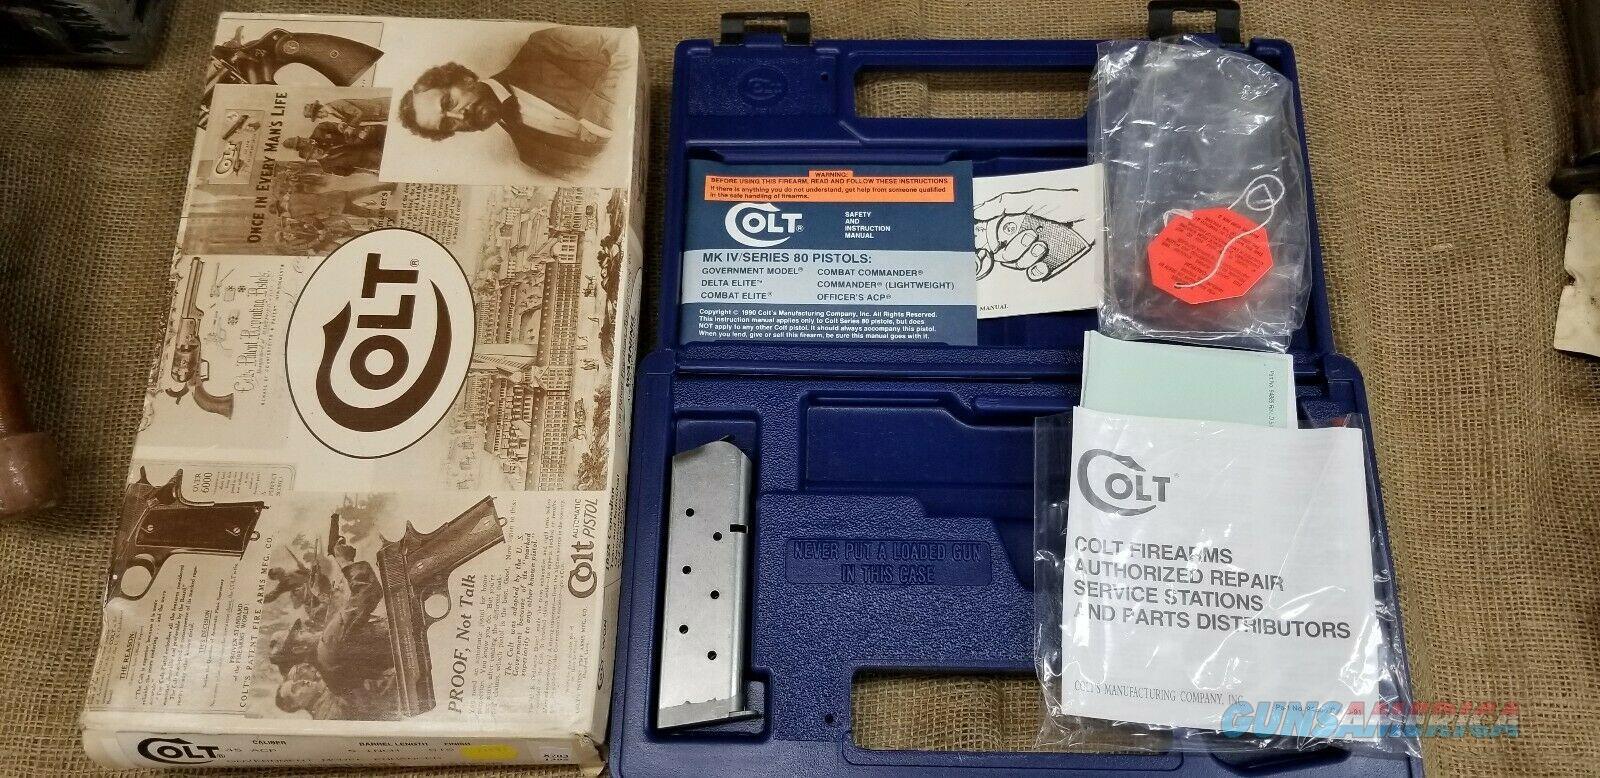 Colt Government Model Enhanced with Magazine  Non-Guns > Gun Cases